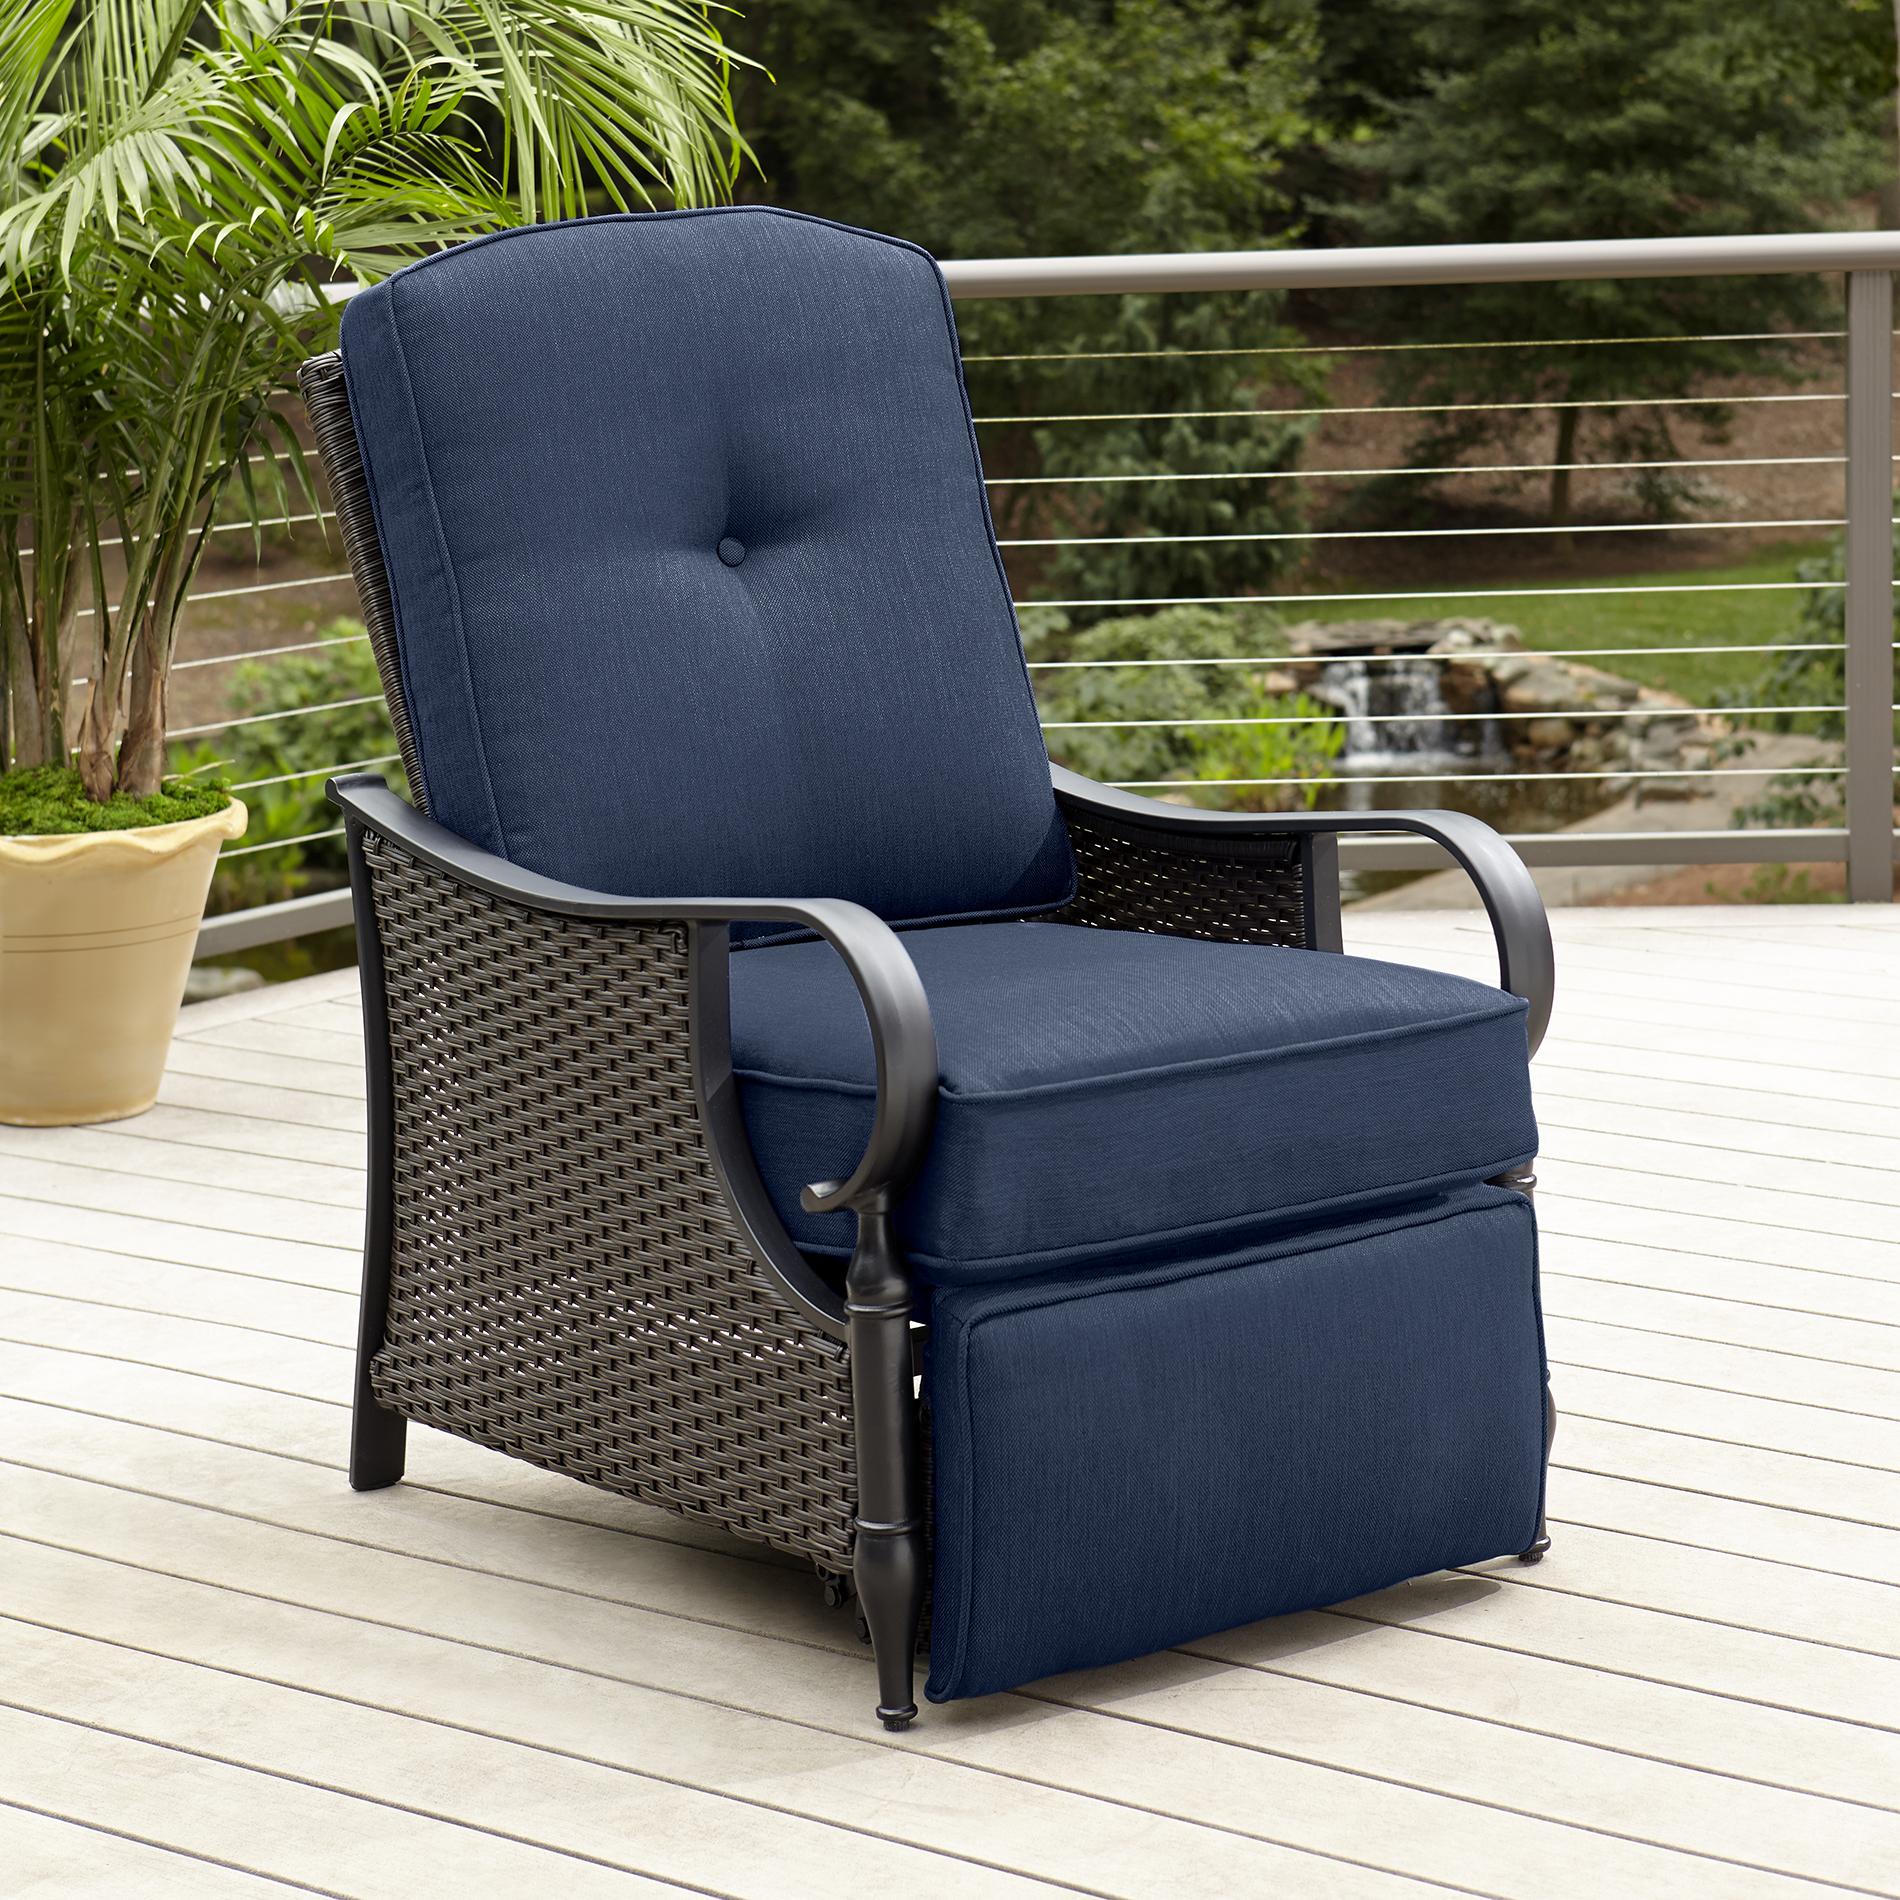 LaZBoy Outdoor Kayla Recliner  Blue